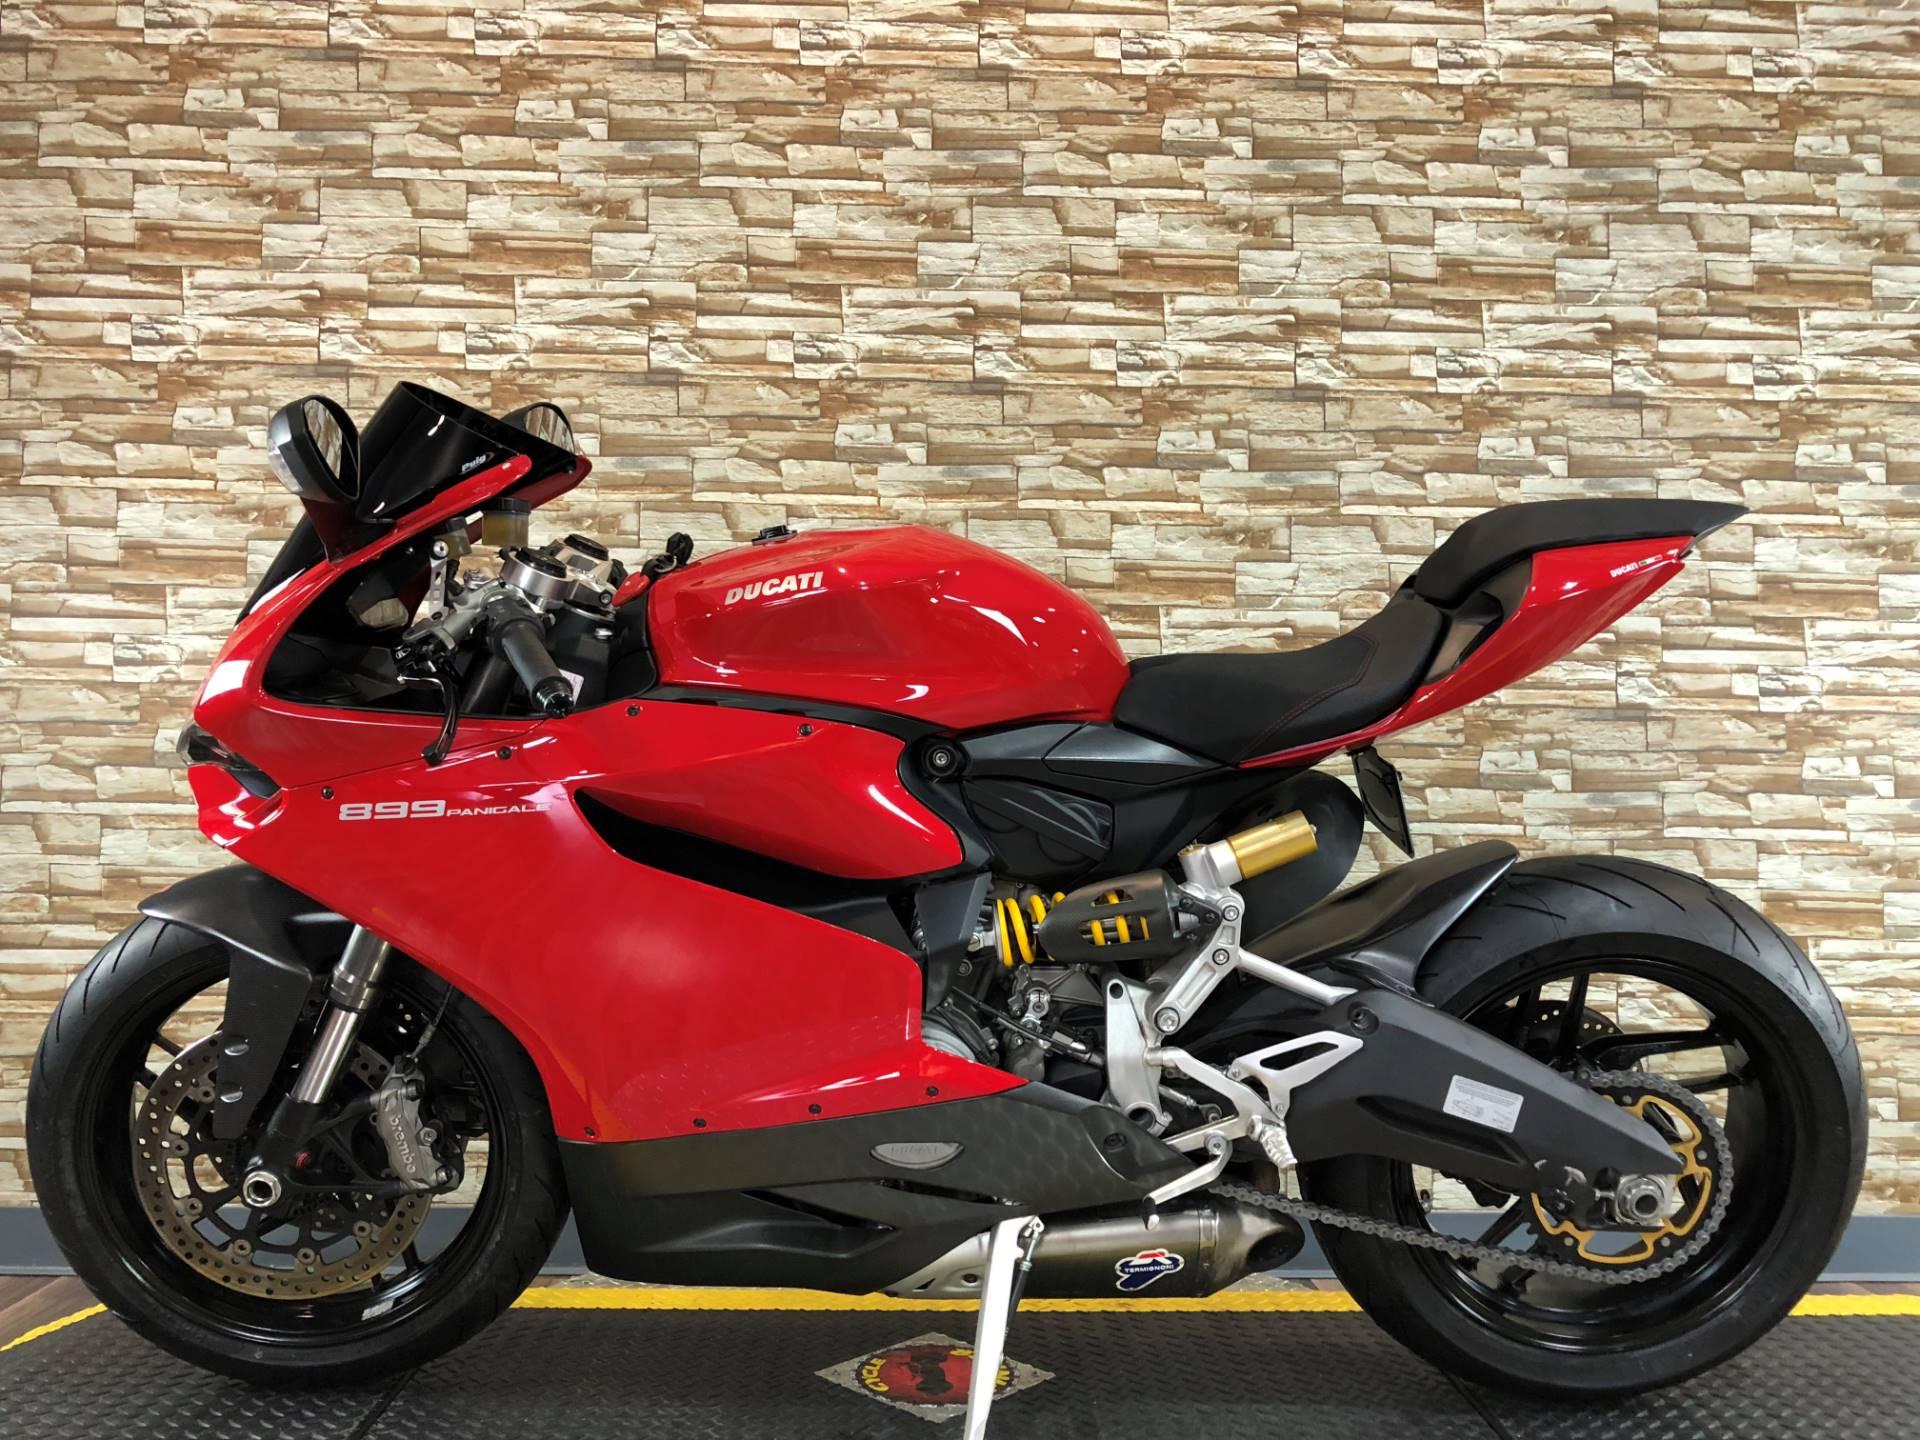 2014 Ducati Superbike 899 Panigale 5